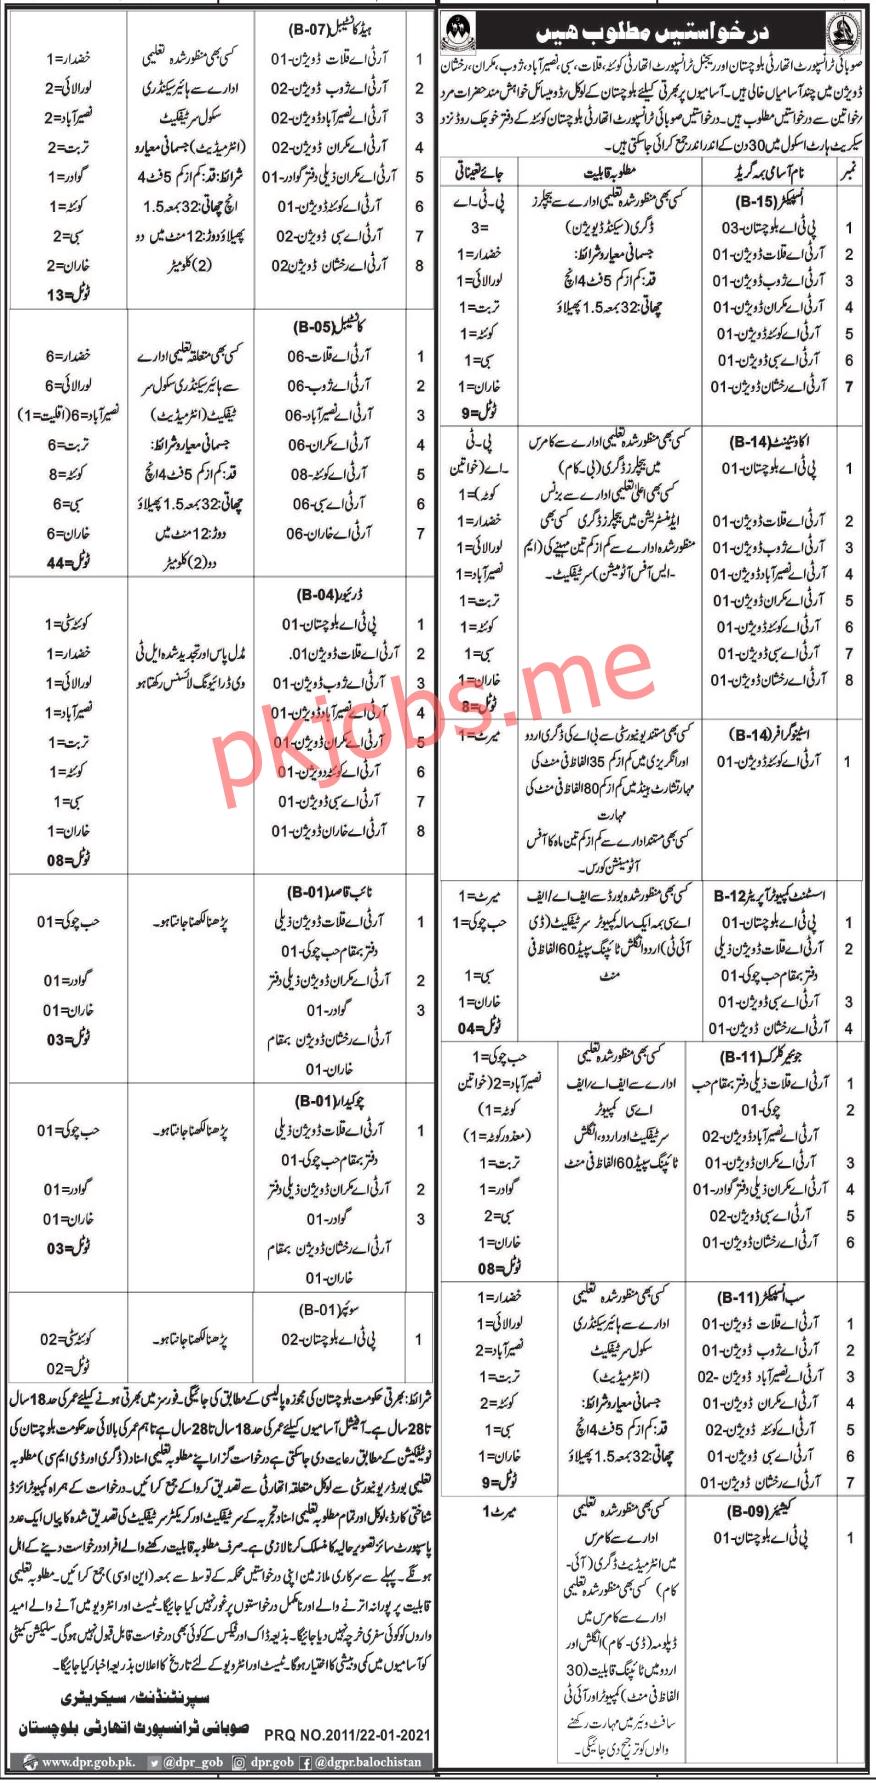 Latest Balochistan Transport Authority Management Posts 2021